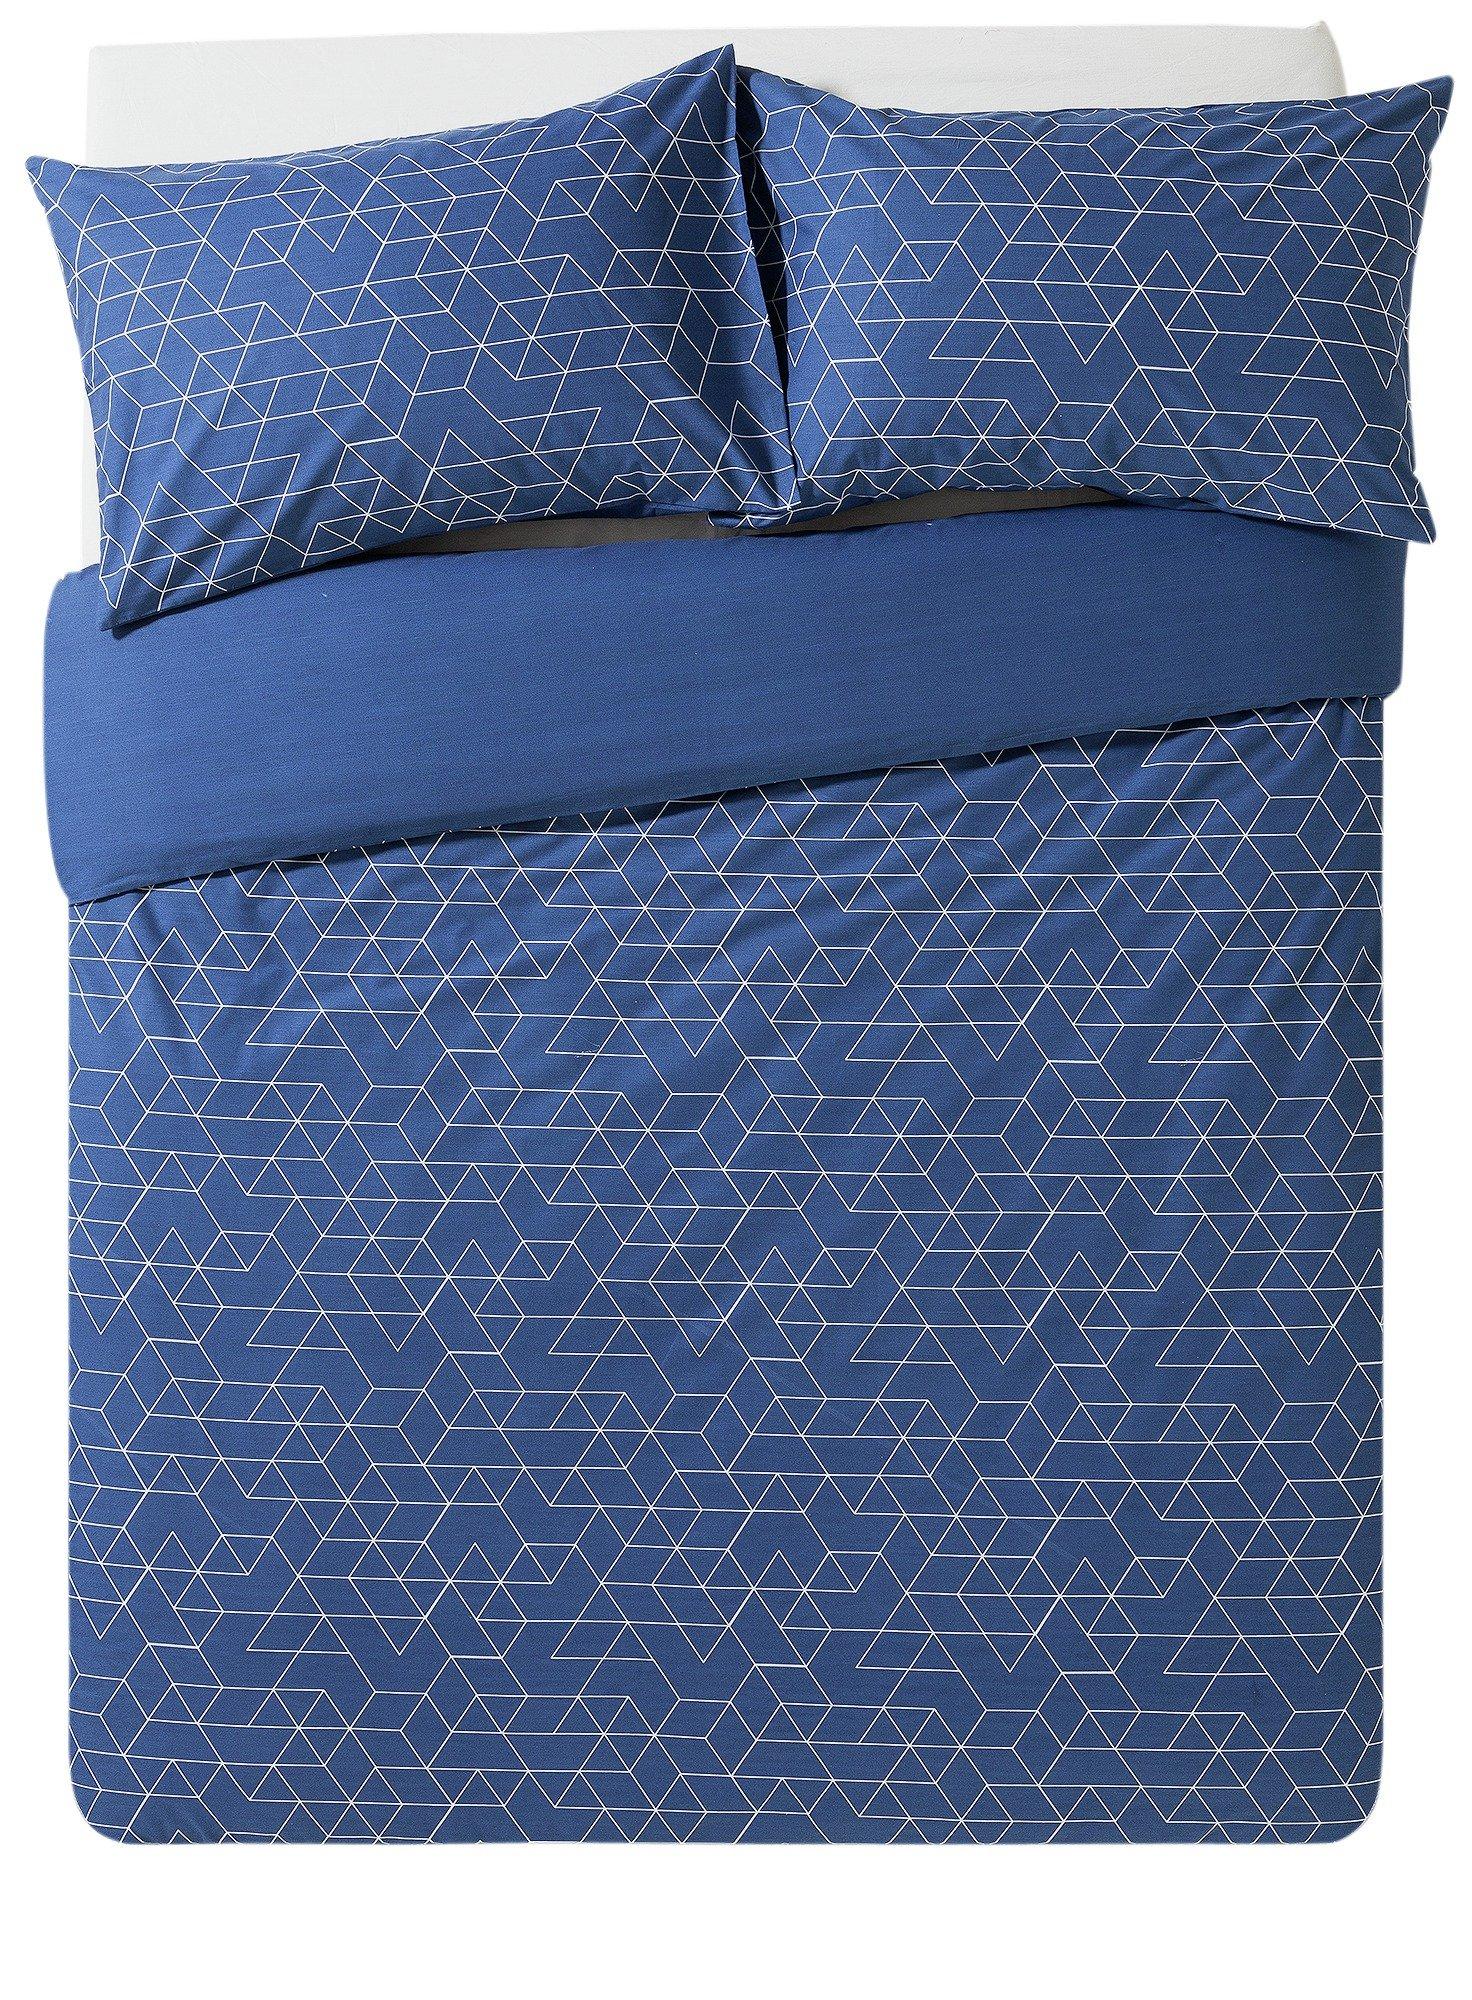 home navy geometric bedding set  double